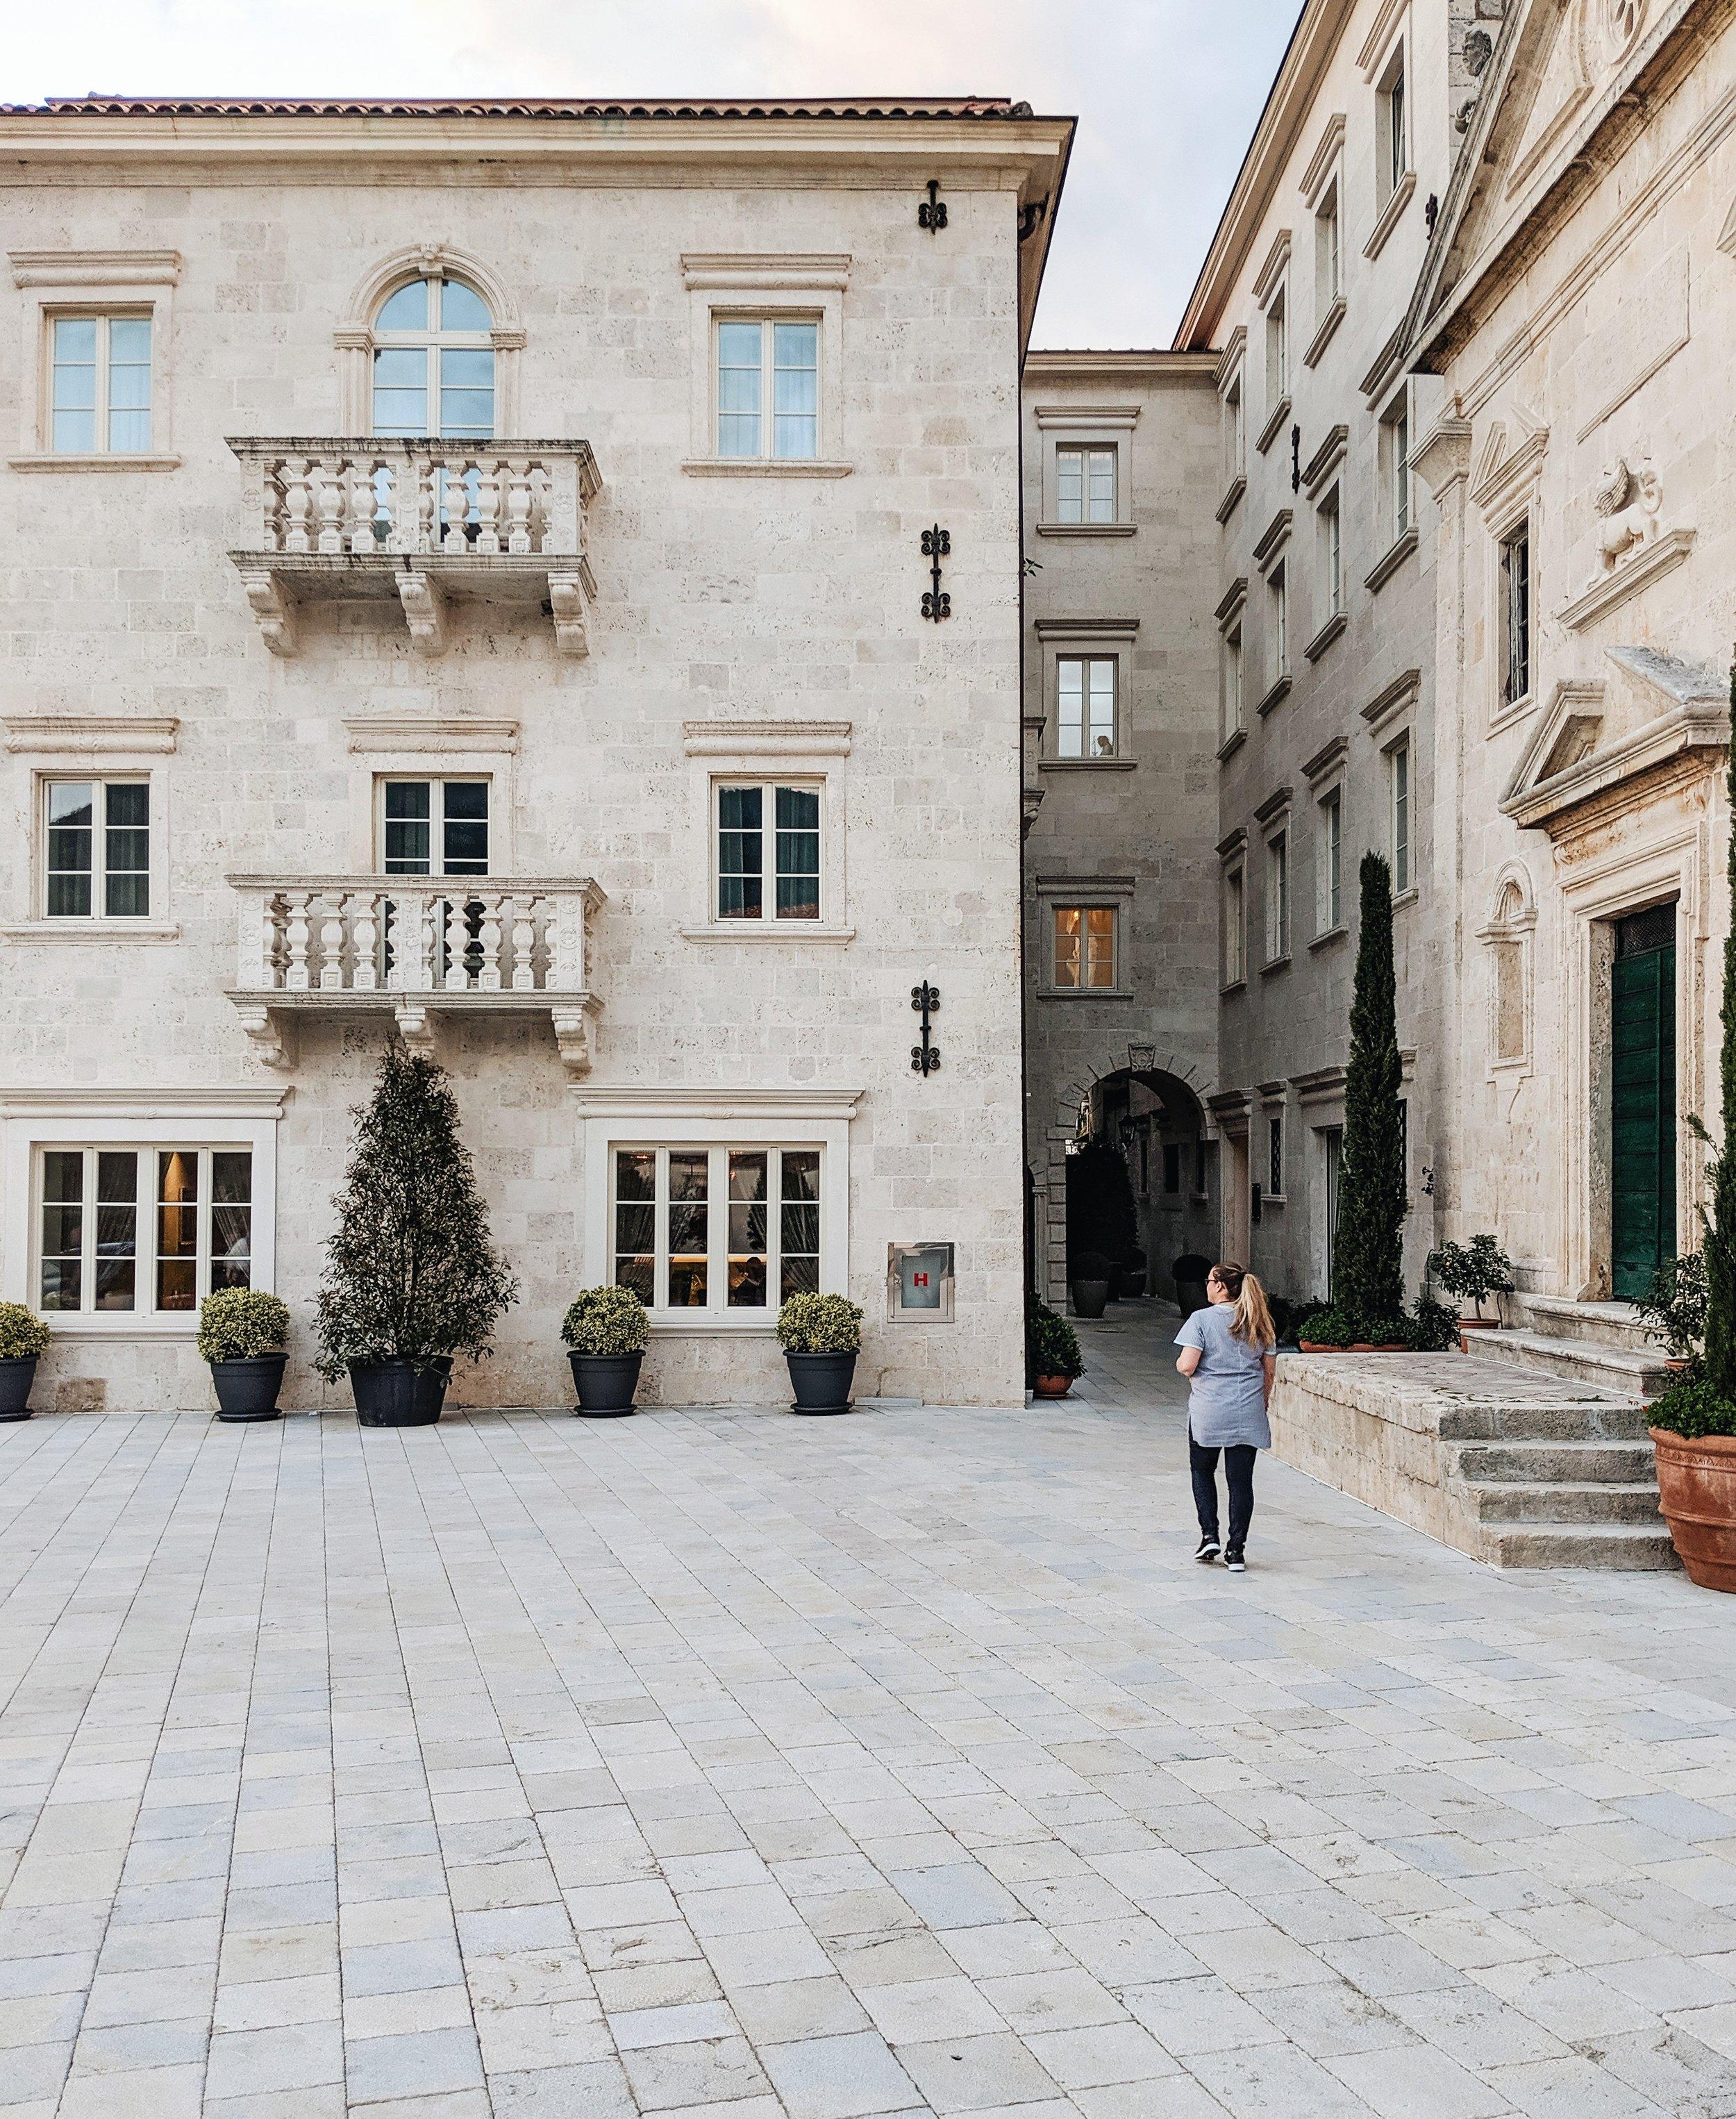 Our Iberostar hotel